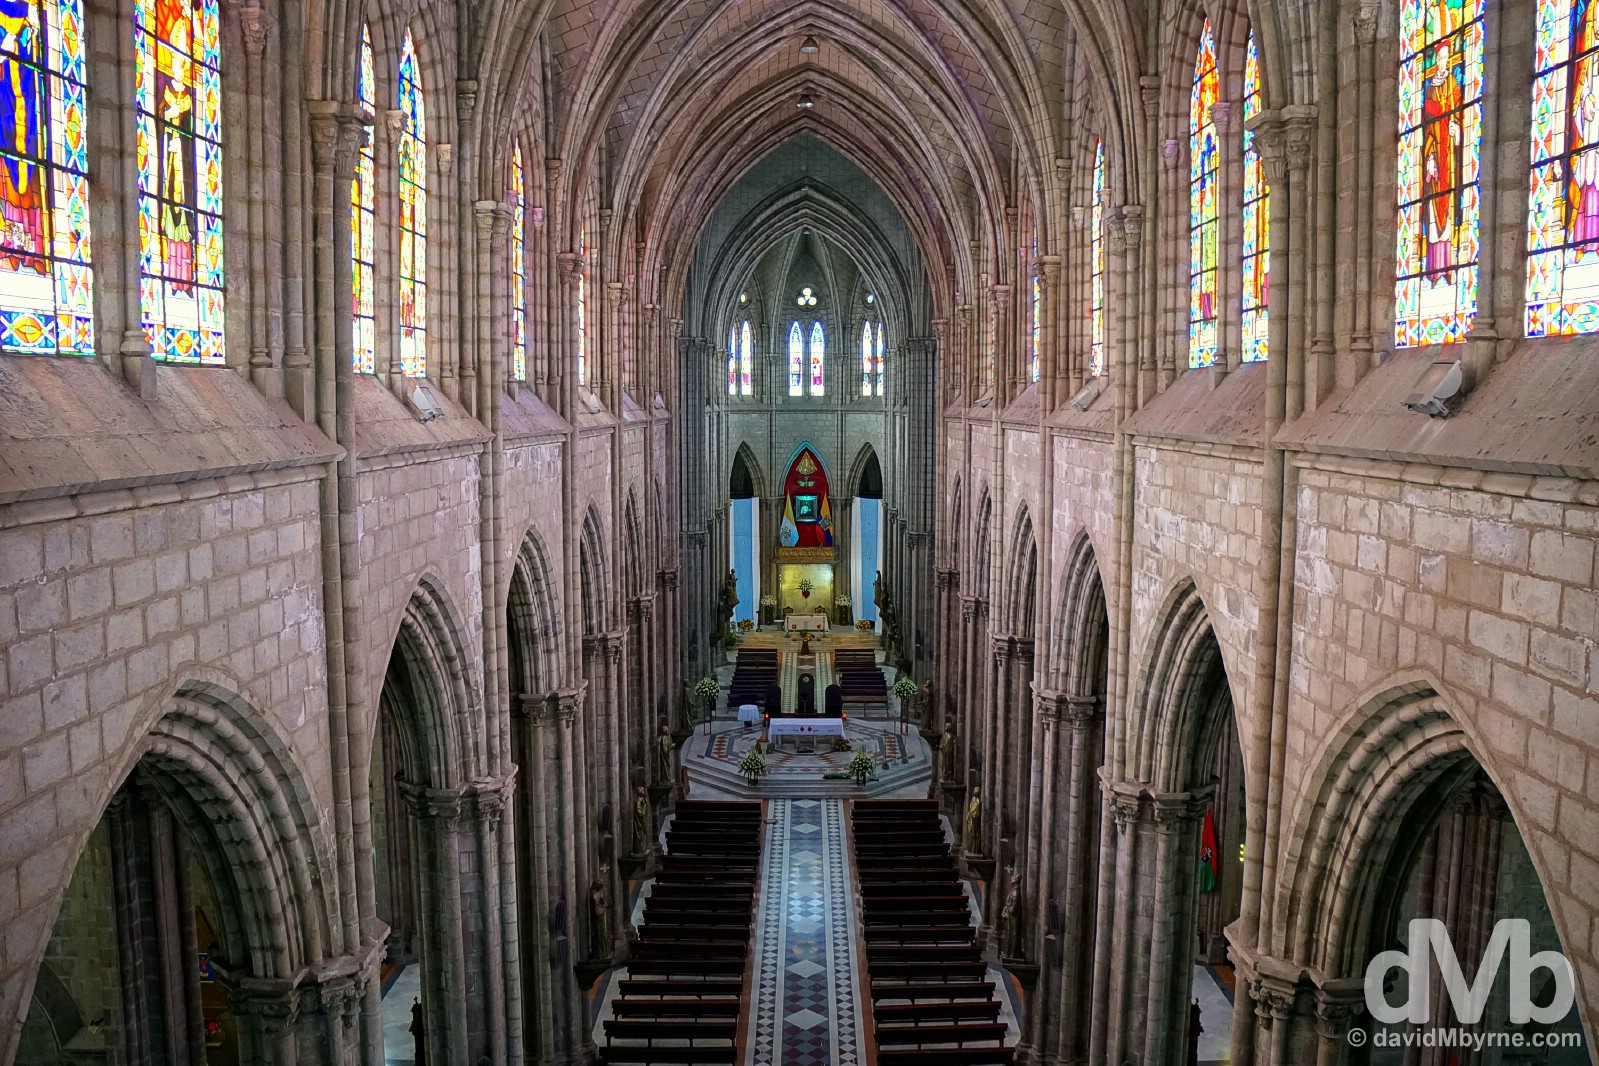 The interior of the Gothic Basilica del Voto Nacional in Quito, Ecuador. July 4, 2015.